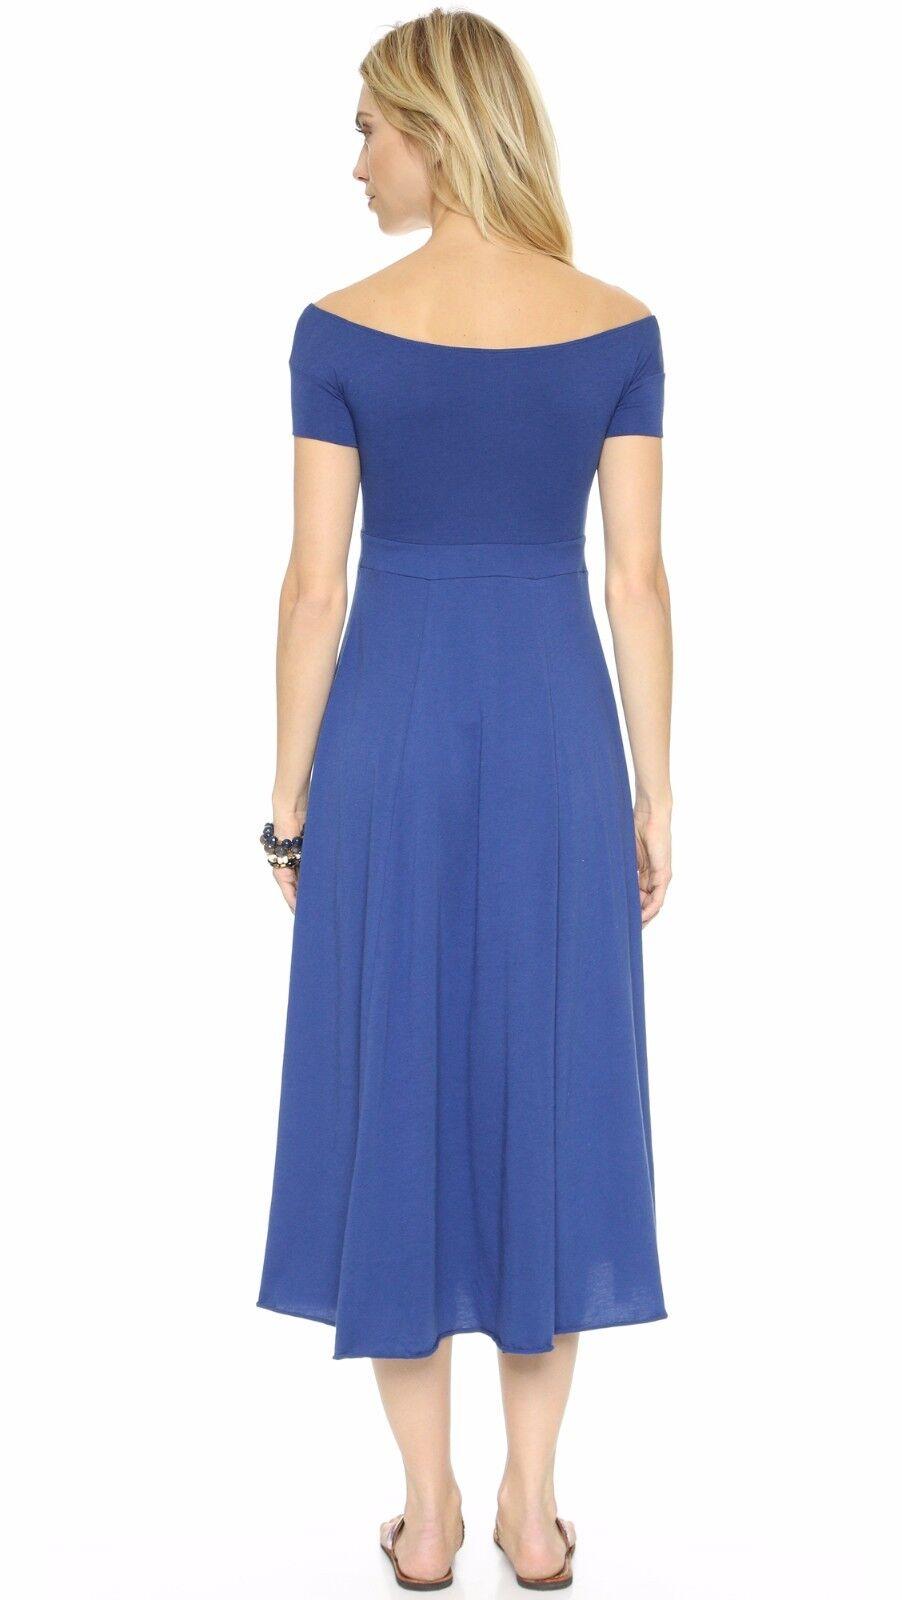 Free People People People 'Dance With Me' Dress Sz S Cobalt bluee NWT Sexy & Beautiful  63c728